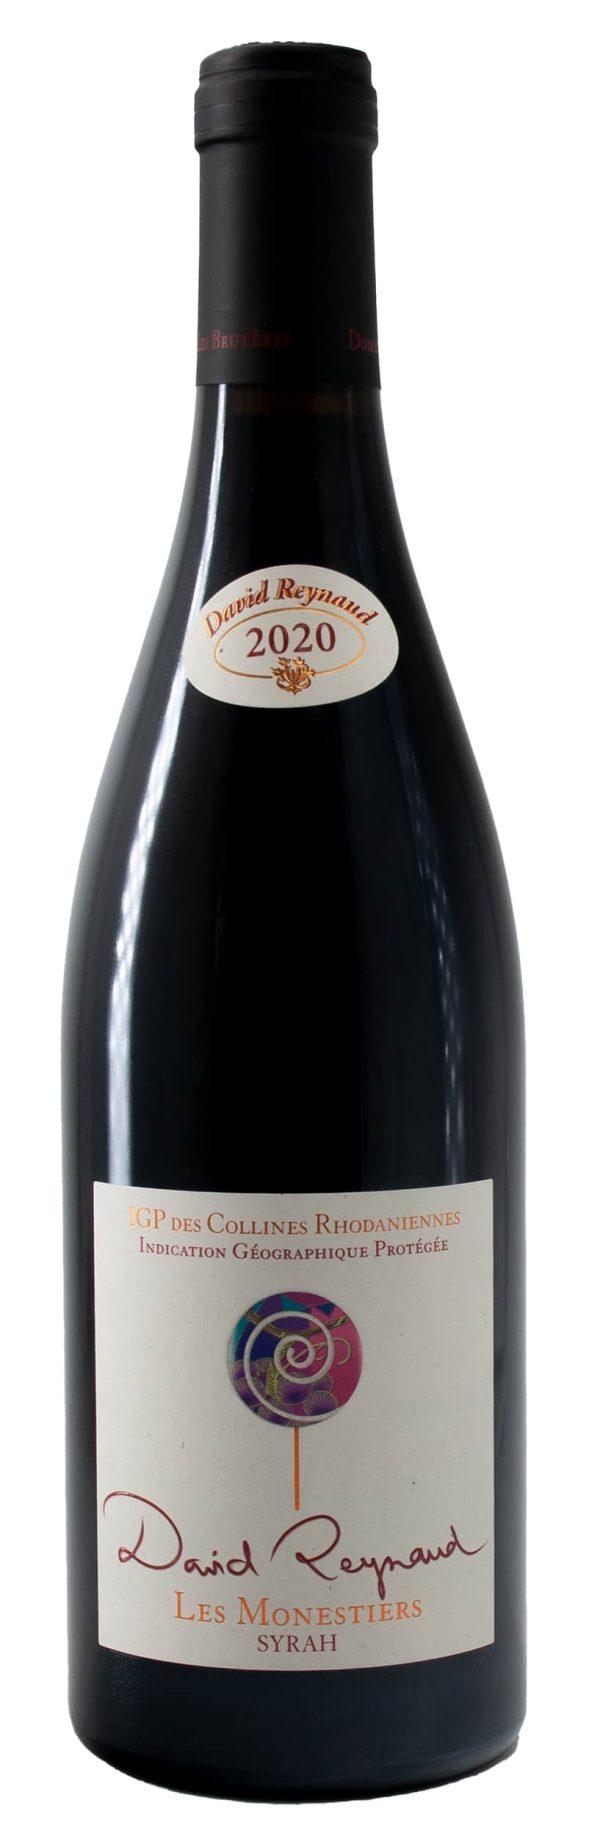 6 Flaschen 2020 Les Monestiers Syrah